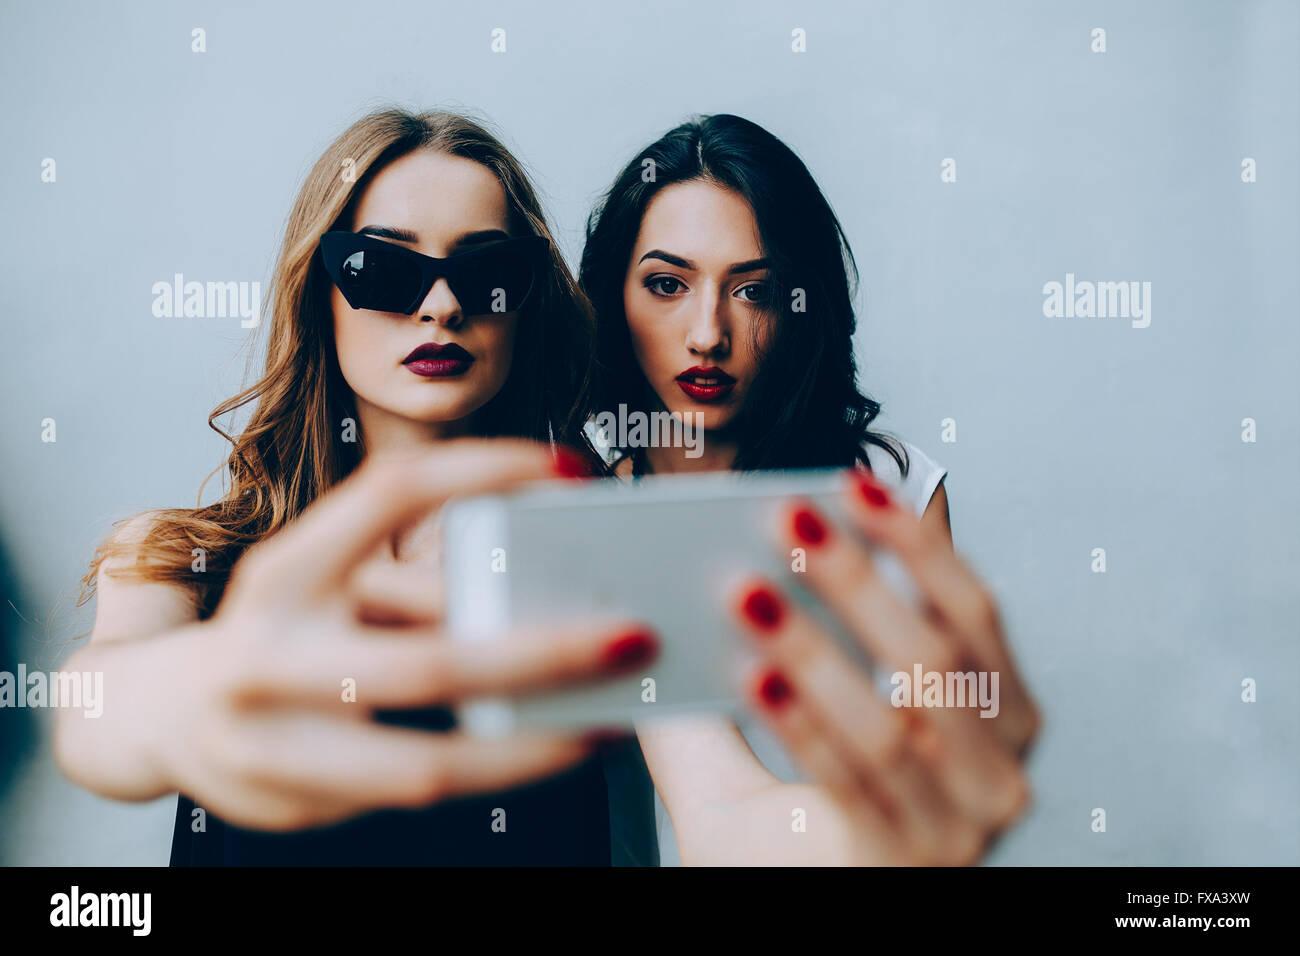 Two girlfriends taking a selfie - Stock Image